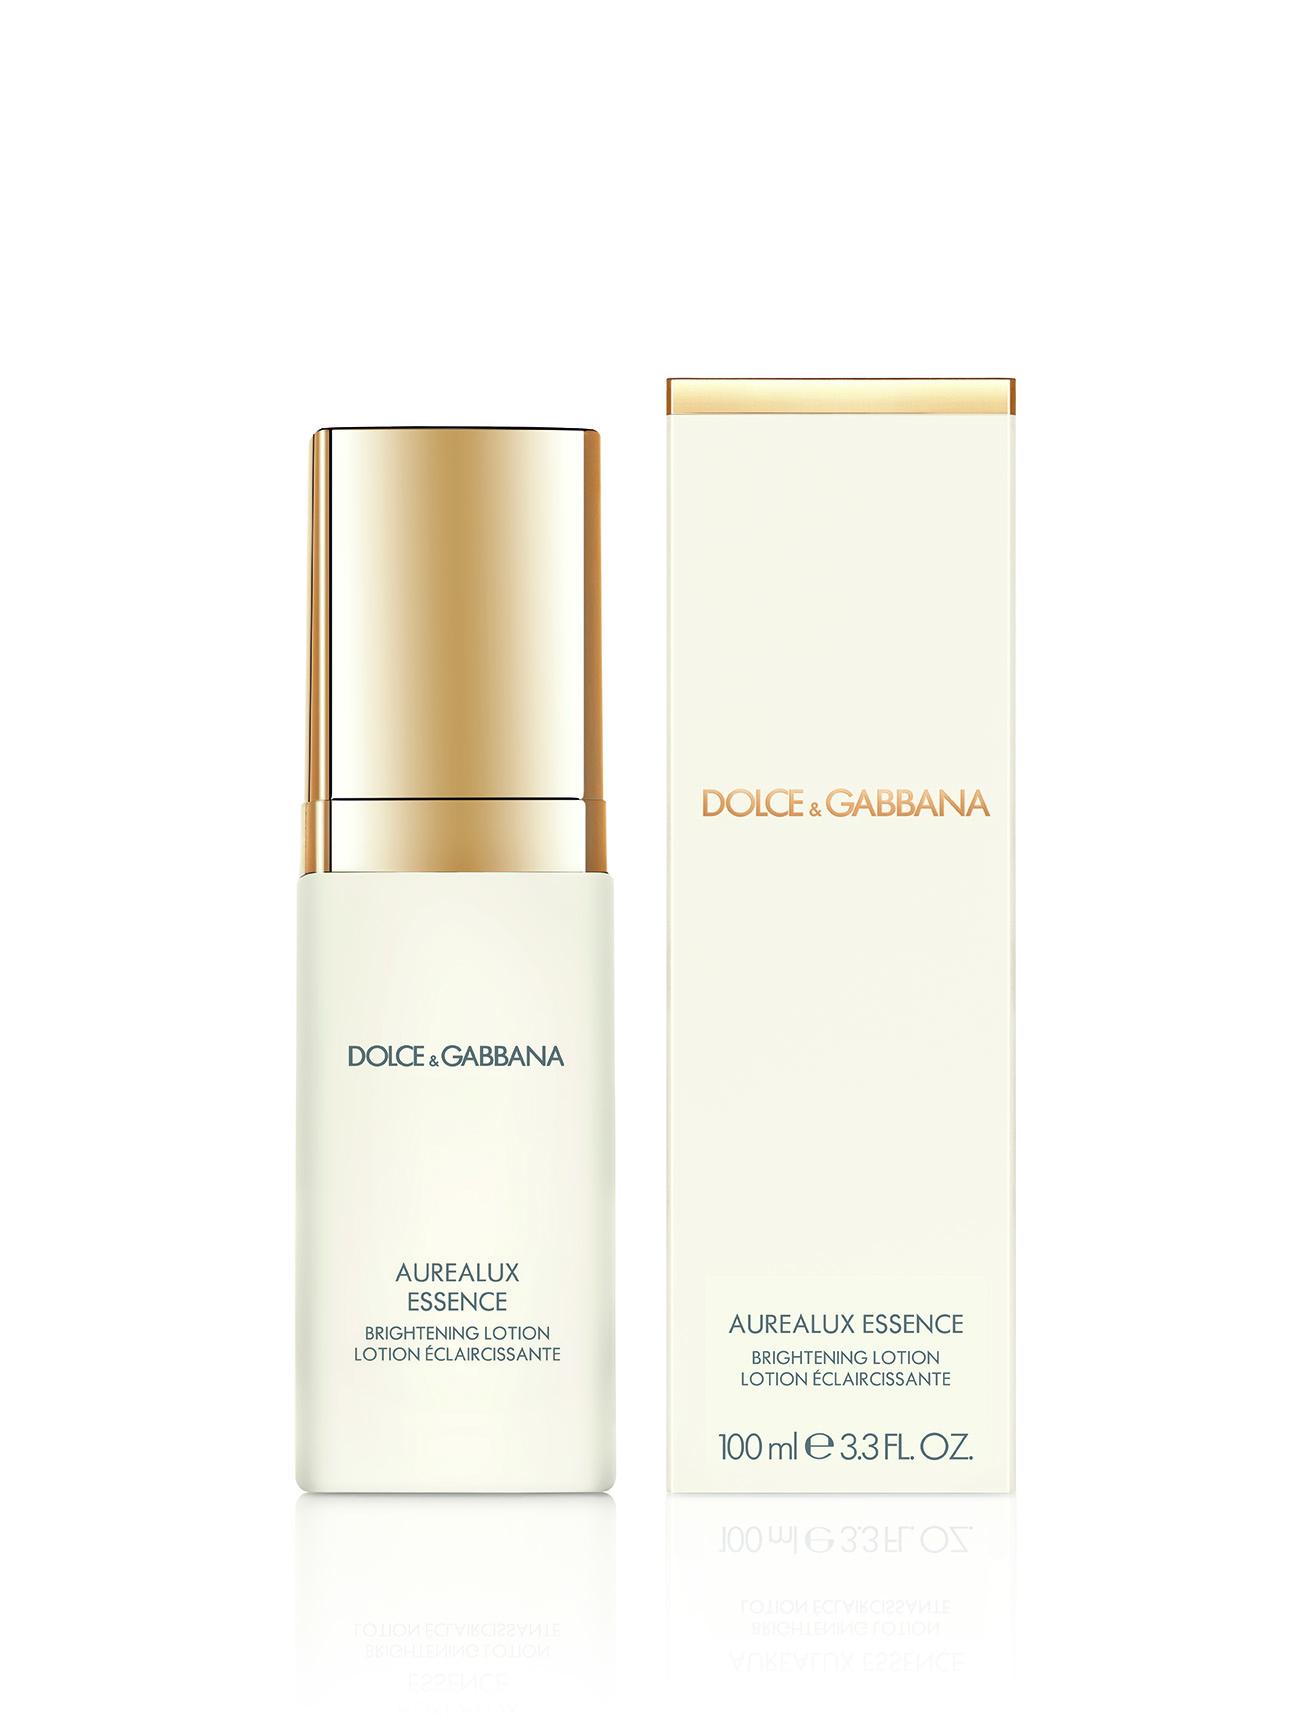 Dolce & Gabbana Skincare Aurealux Essence (100 ml, PVPR 54,50 €)